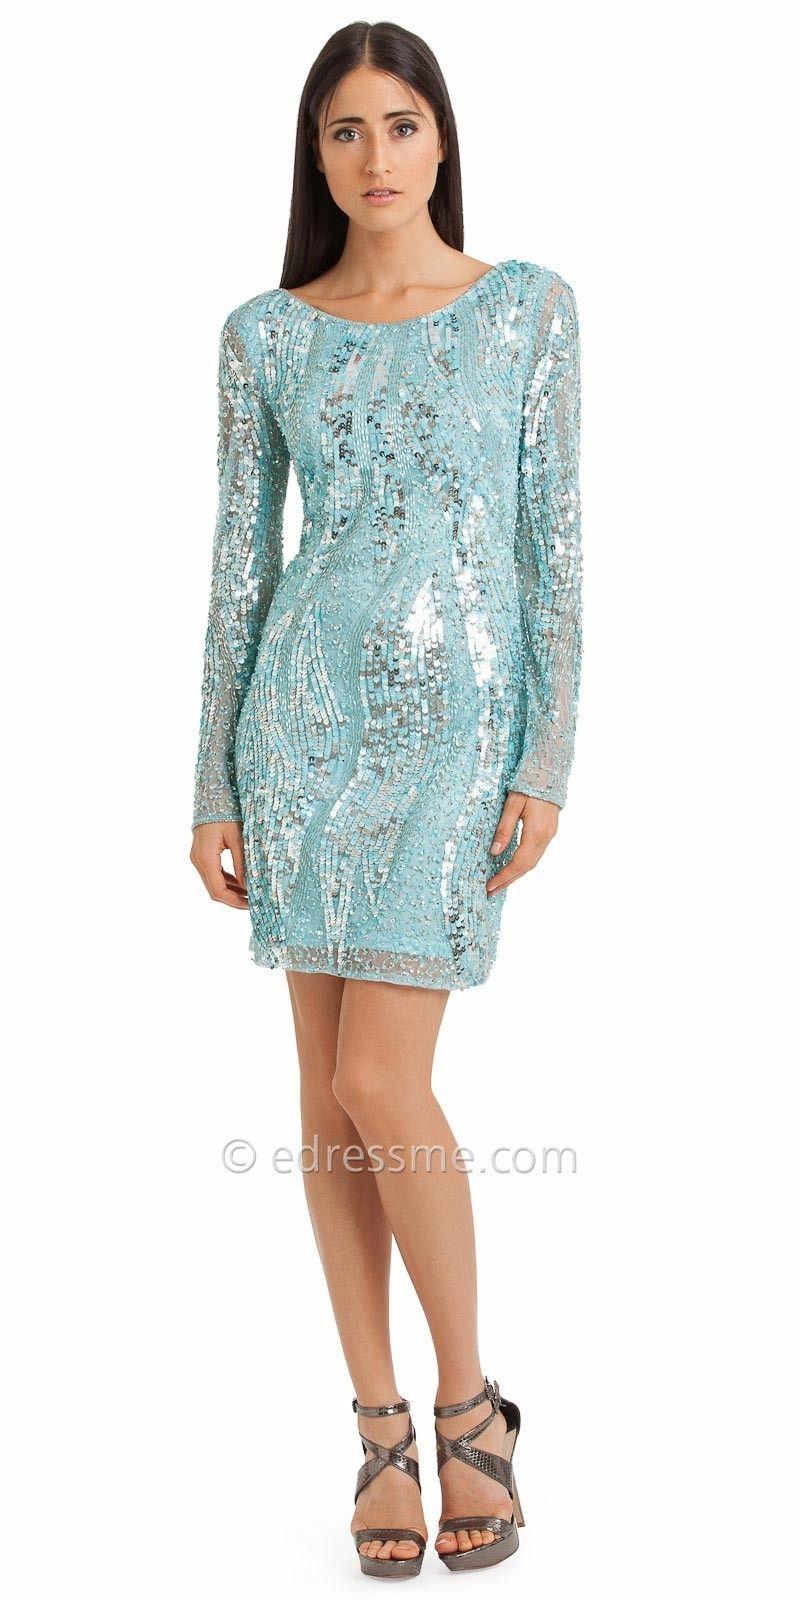 Beaded long sleeve dress